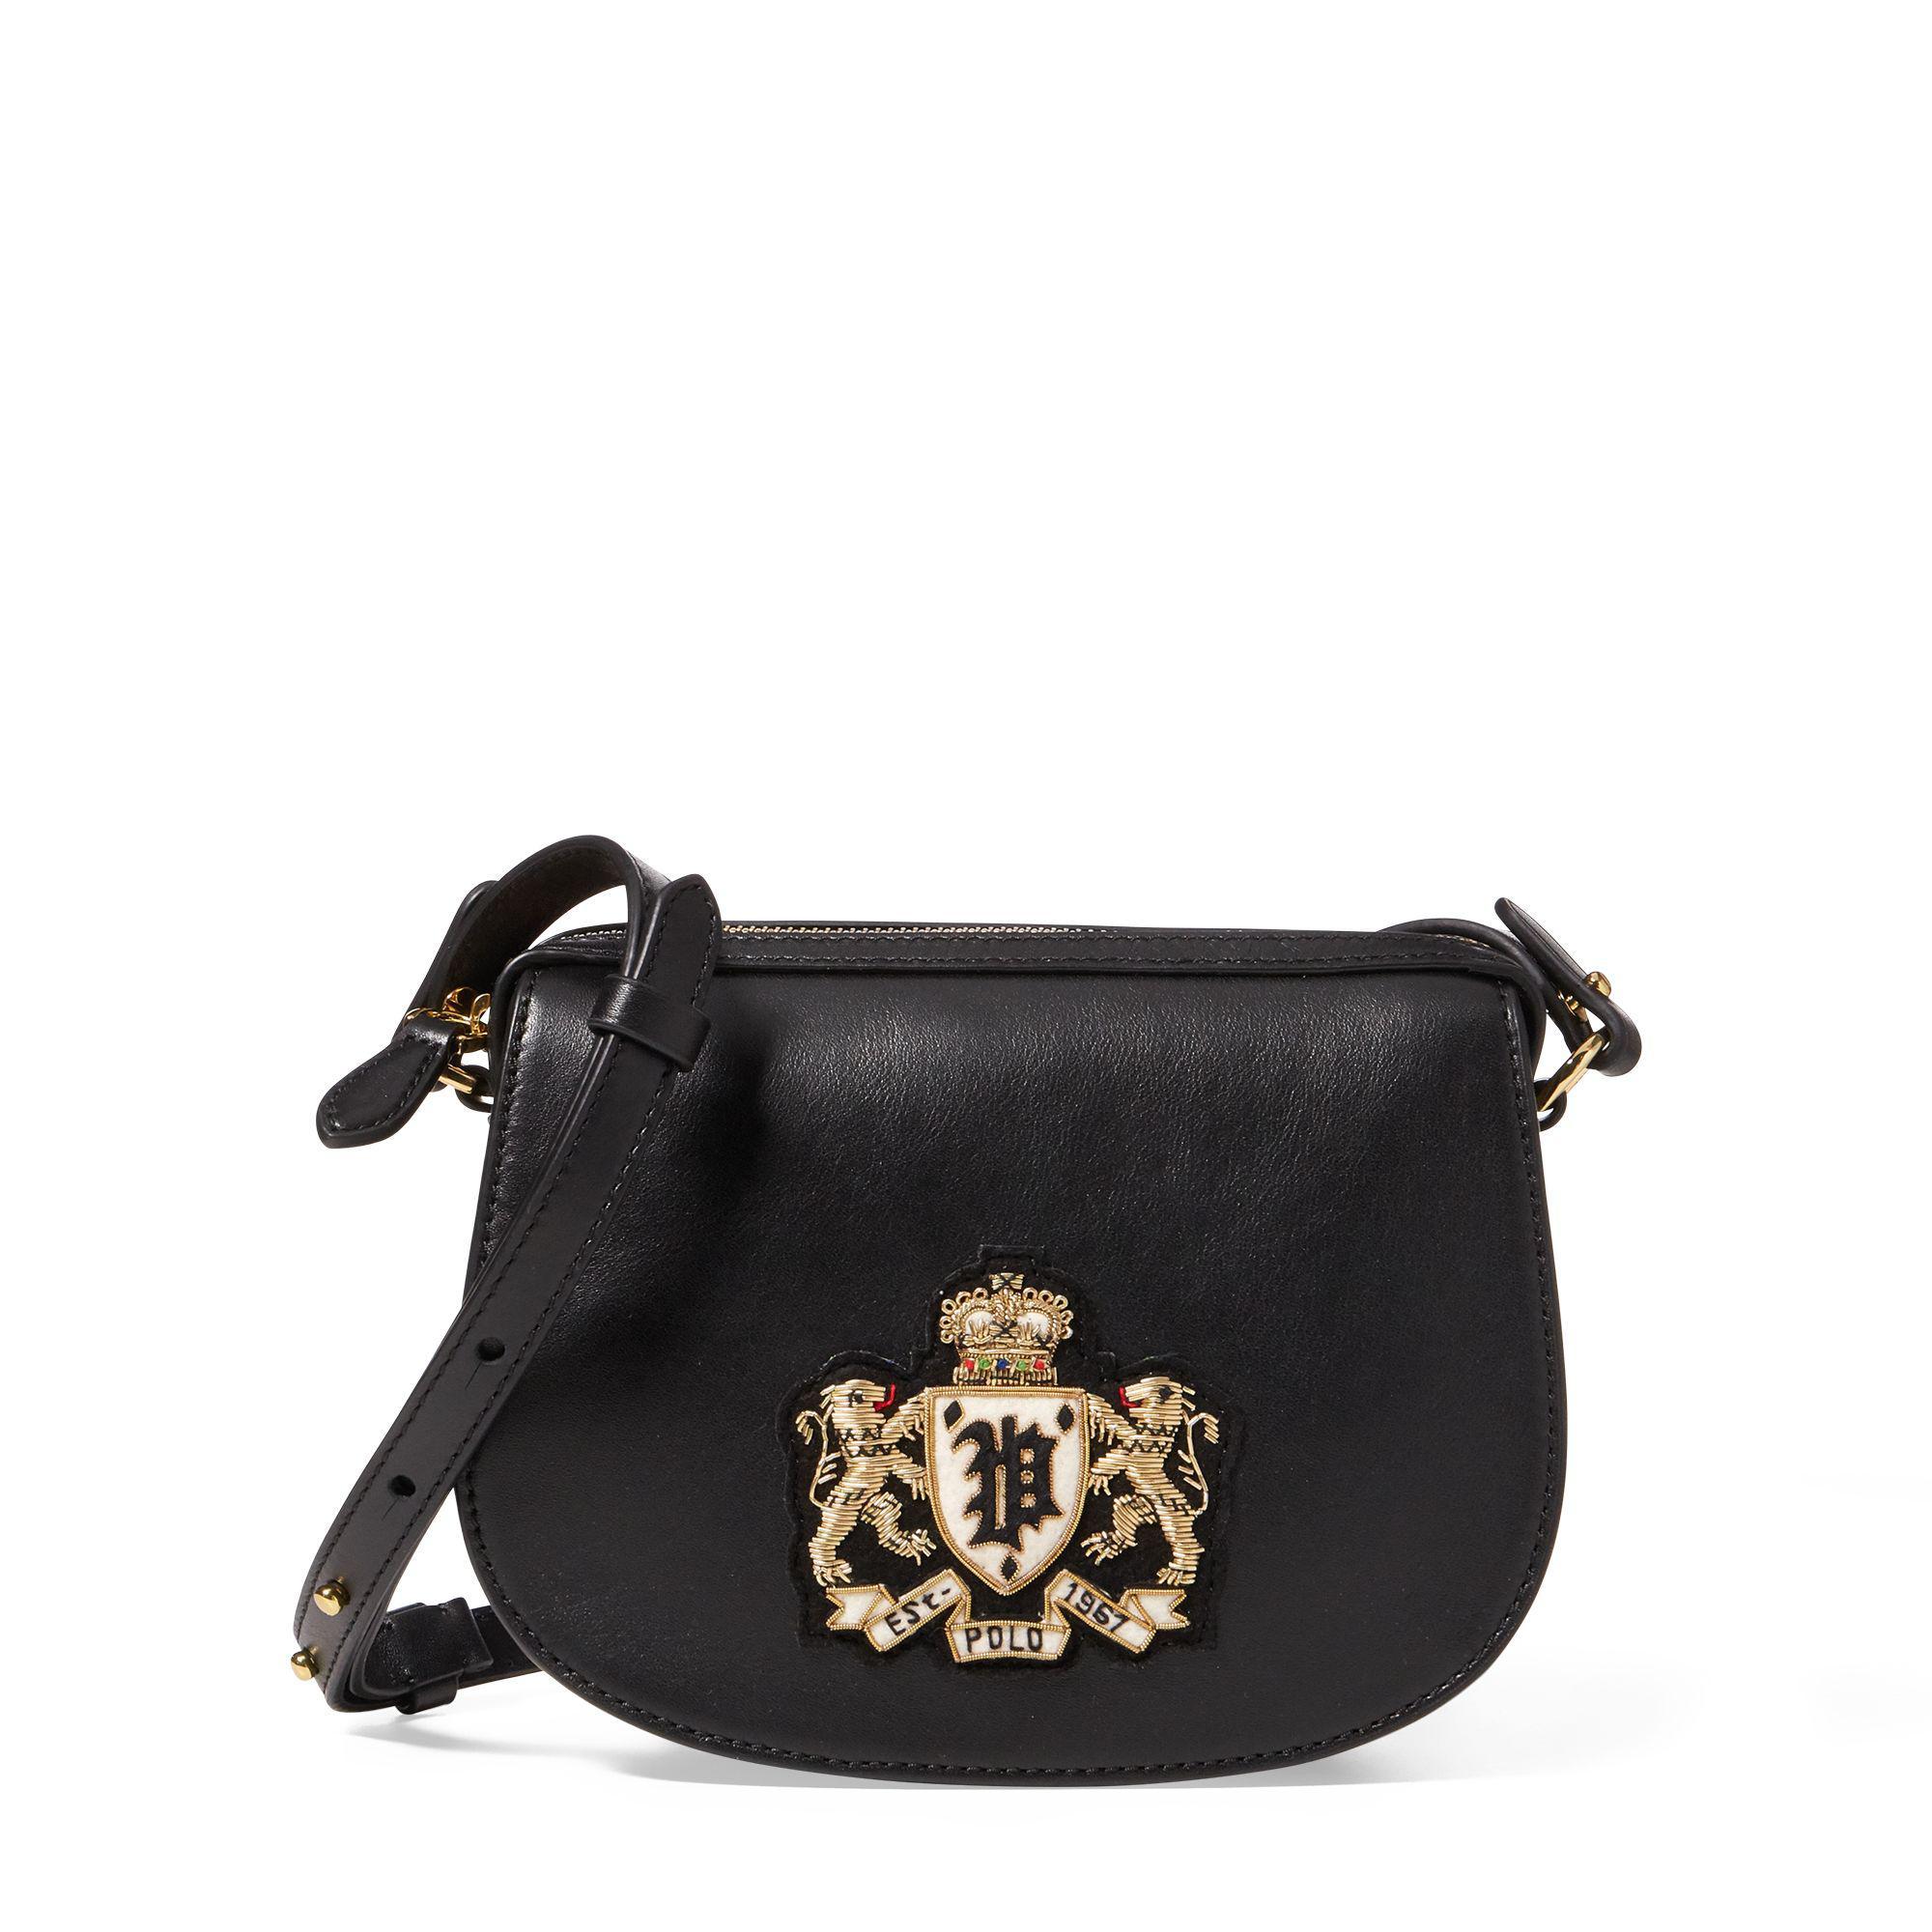 Lyst - Polo Ralph Lauren Bullion-patch Leather Mini Bag in Black 21a158b6a4494